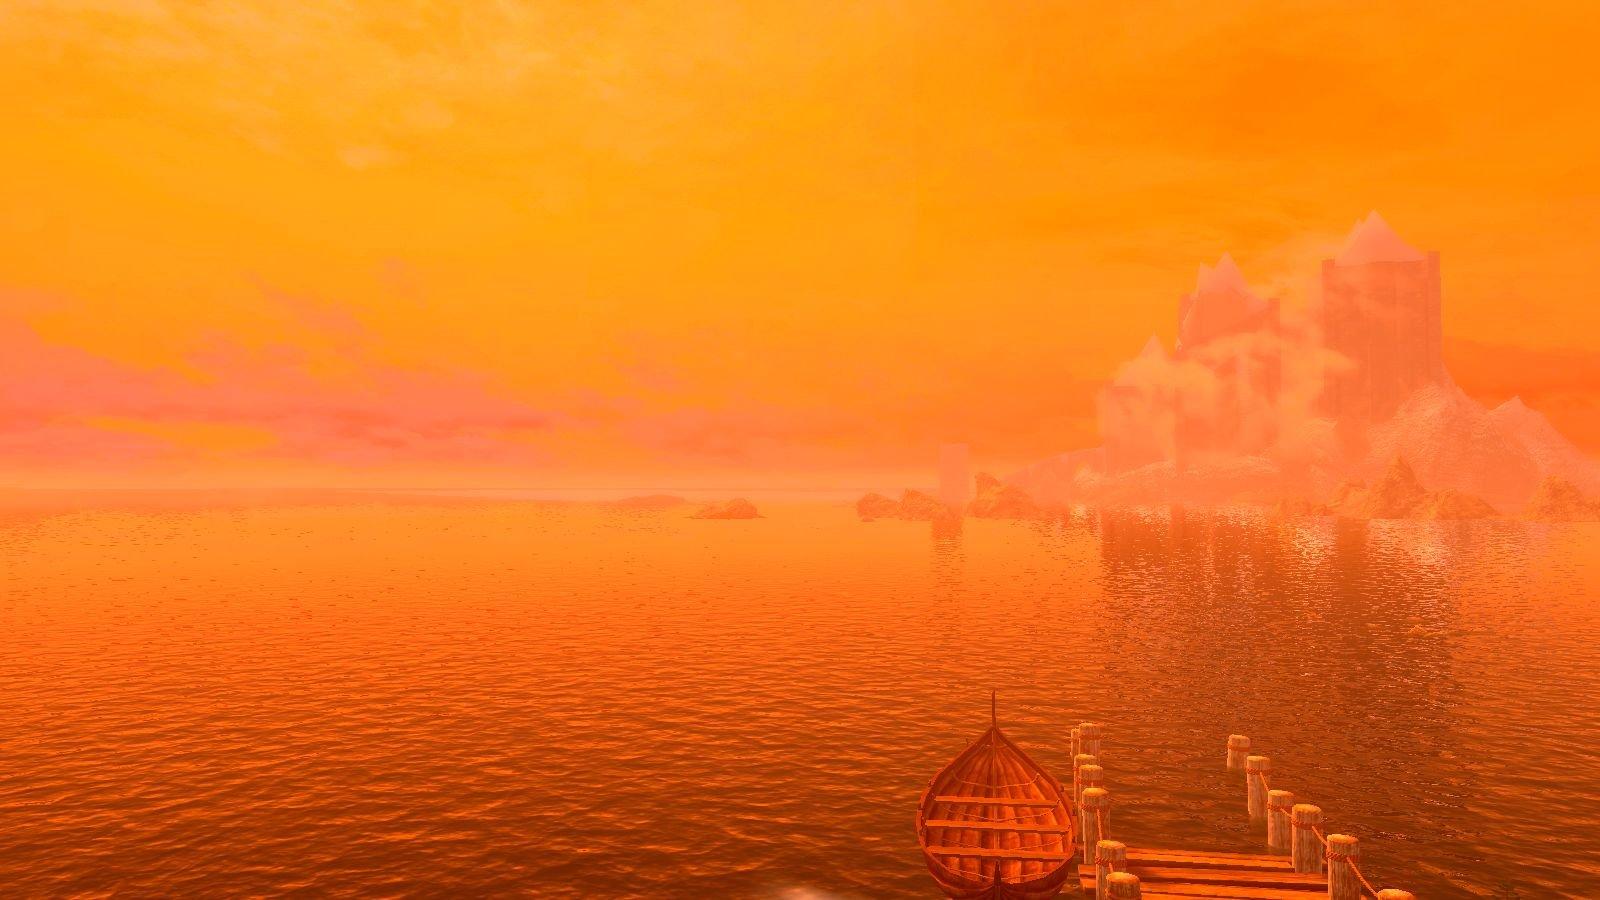 Пейзаж.. SkyrimSE (сборка 6.0 ЛЕТО)